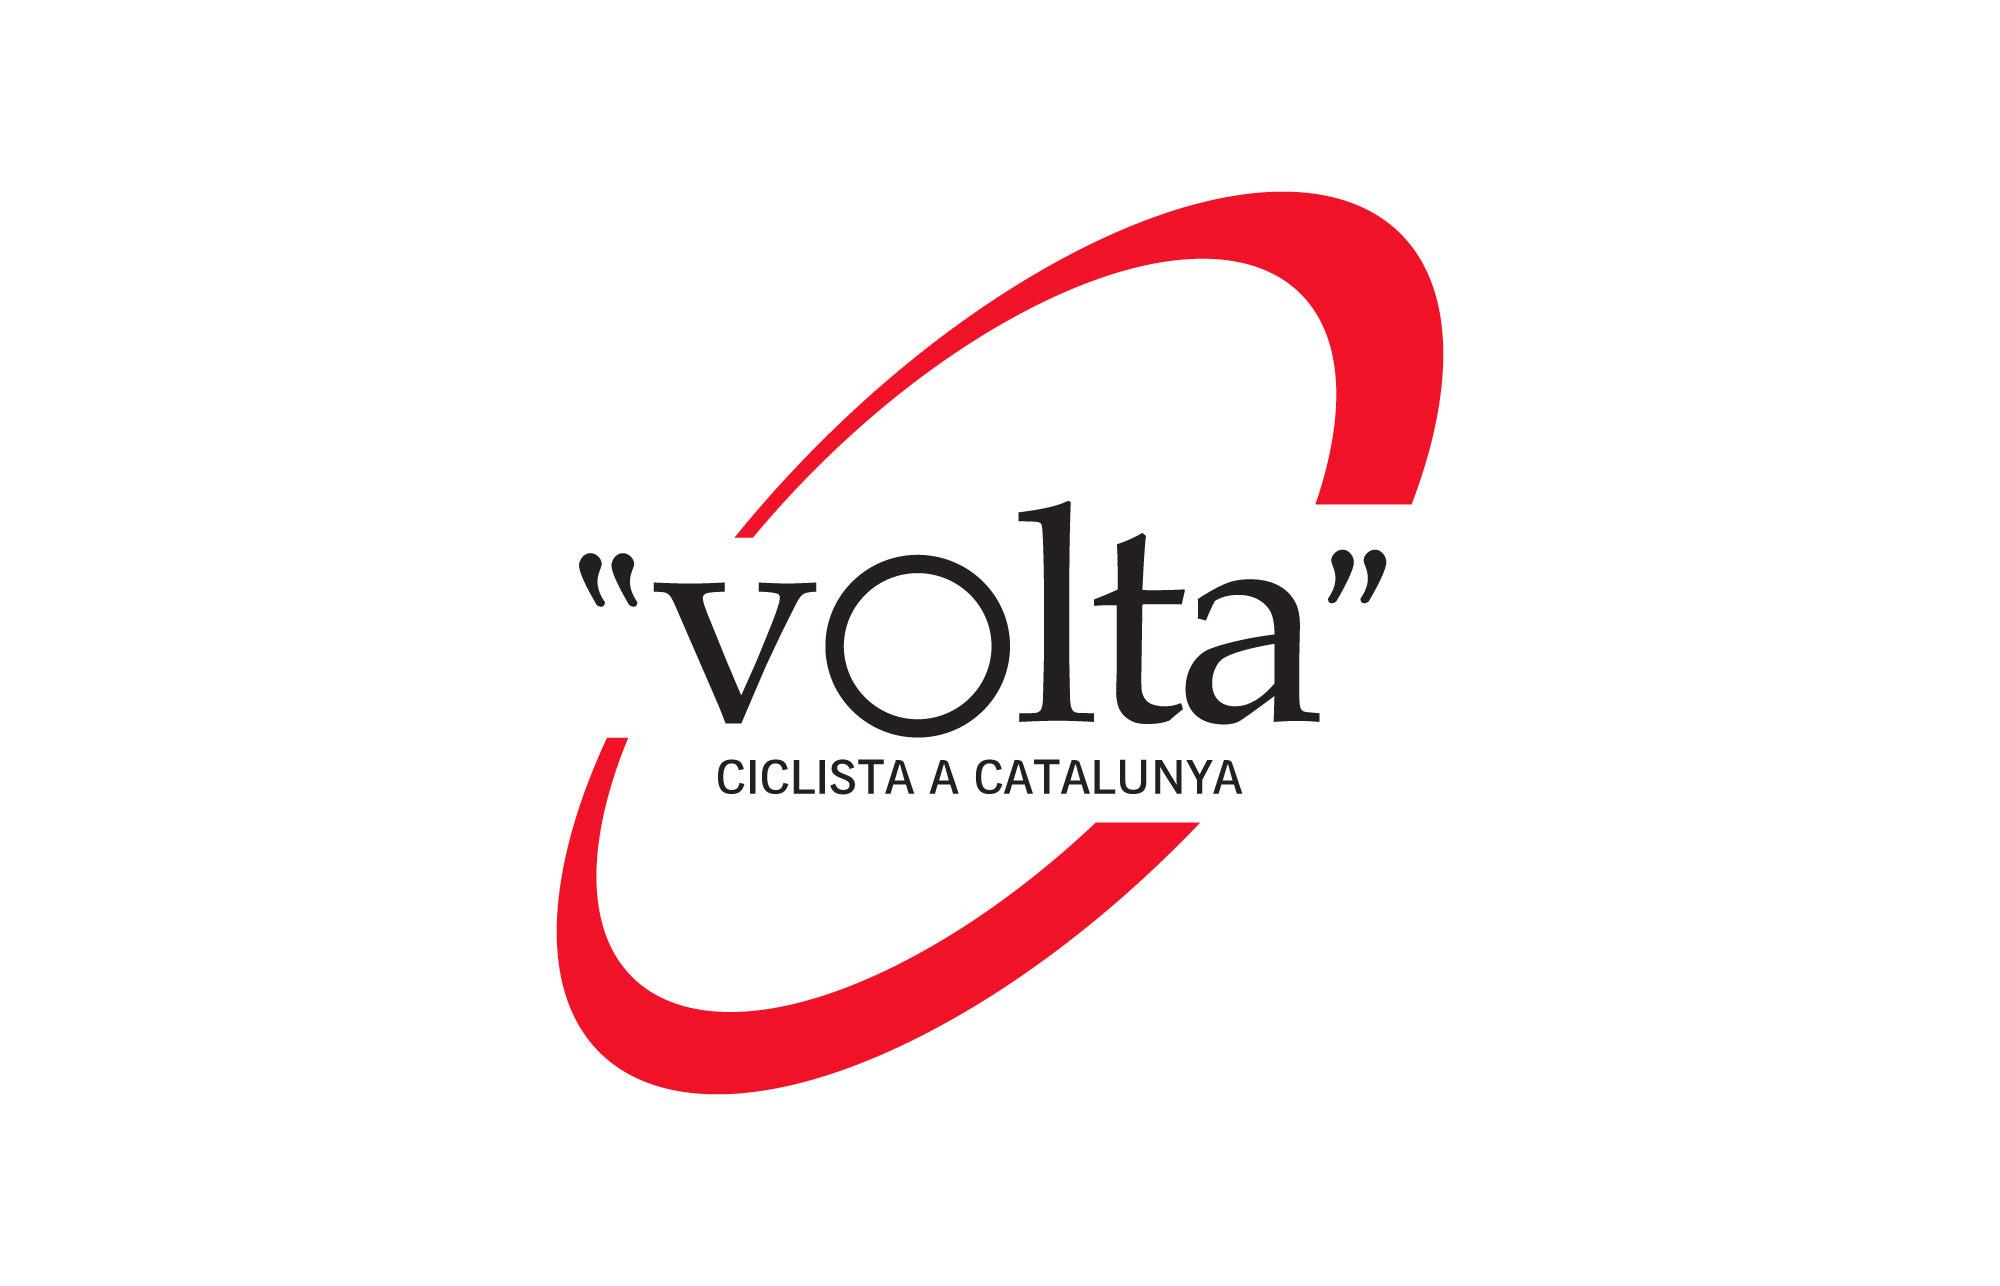 LN-LAVOLTA-1.jpg